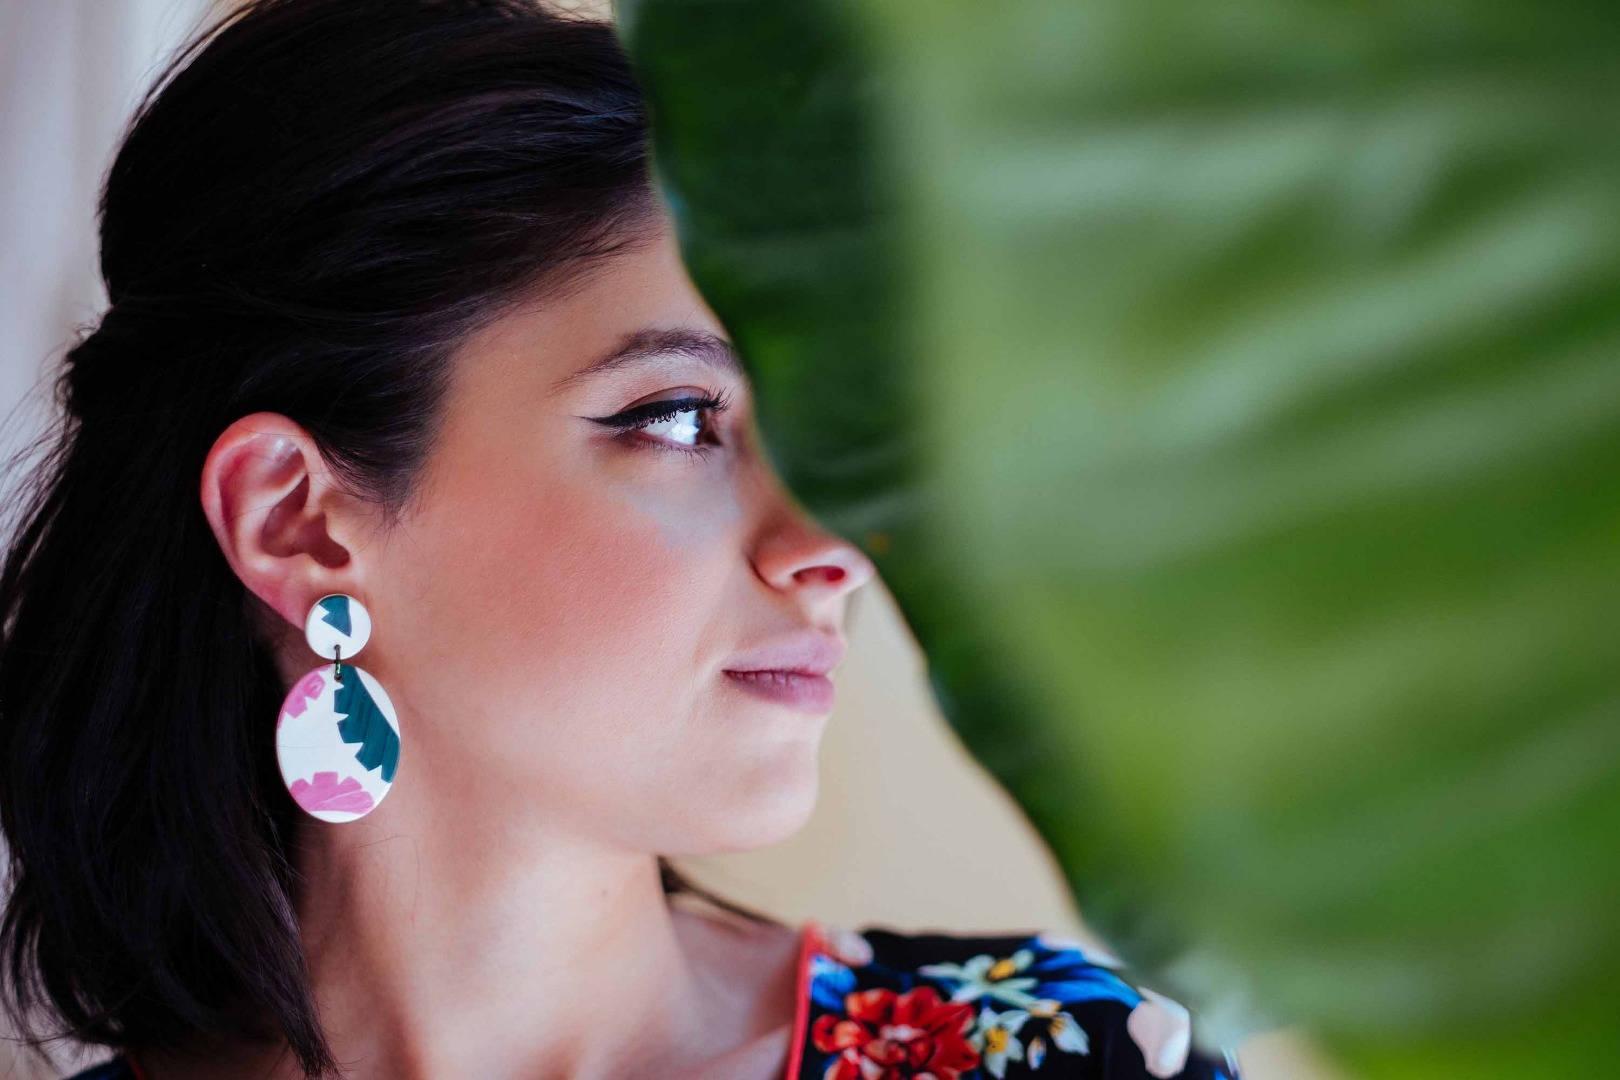 Model wearing colorful drop earrings pos